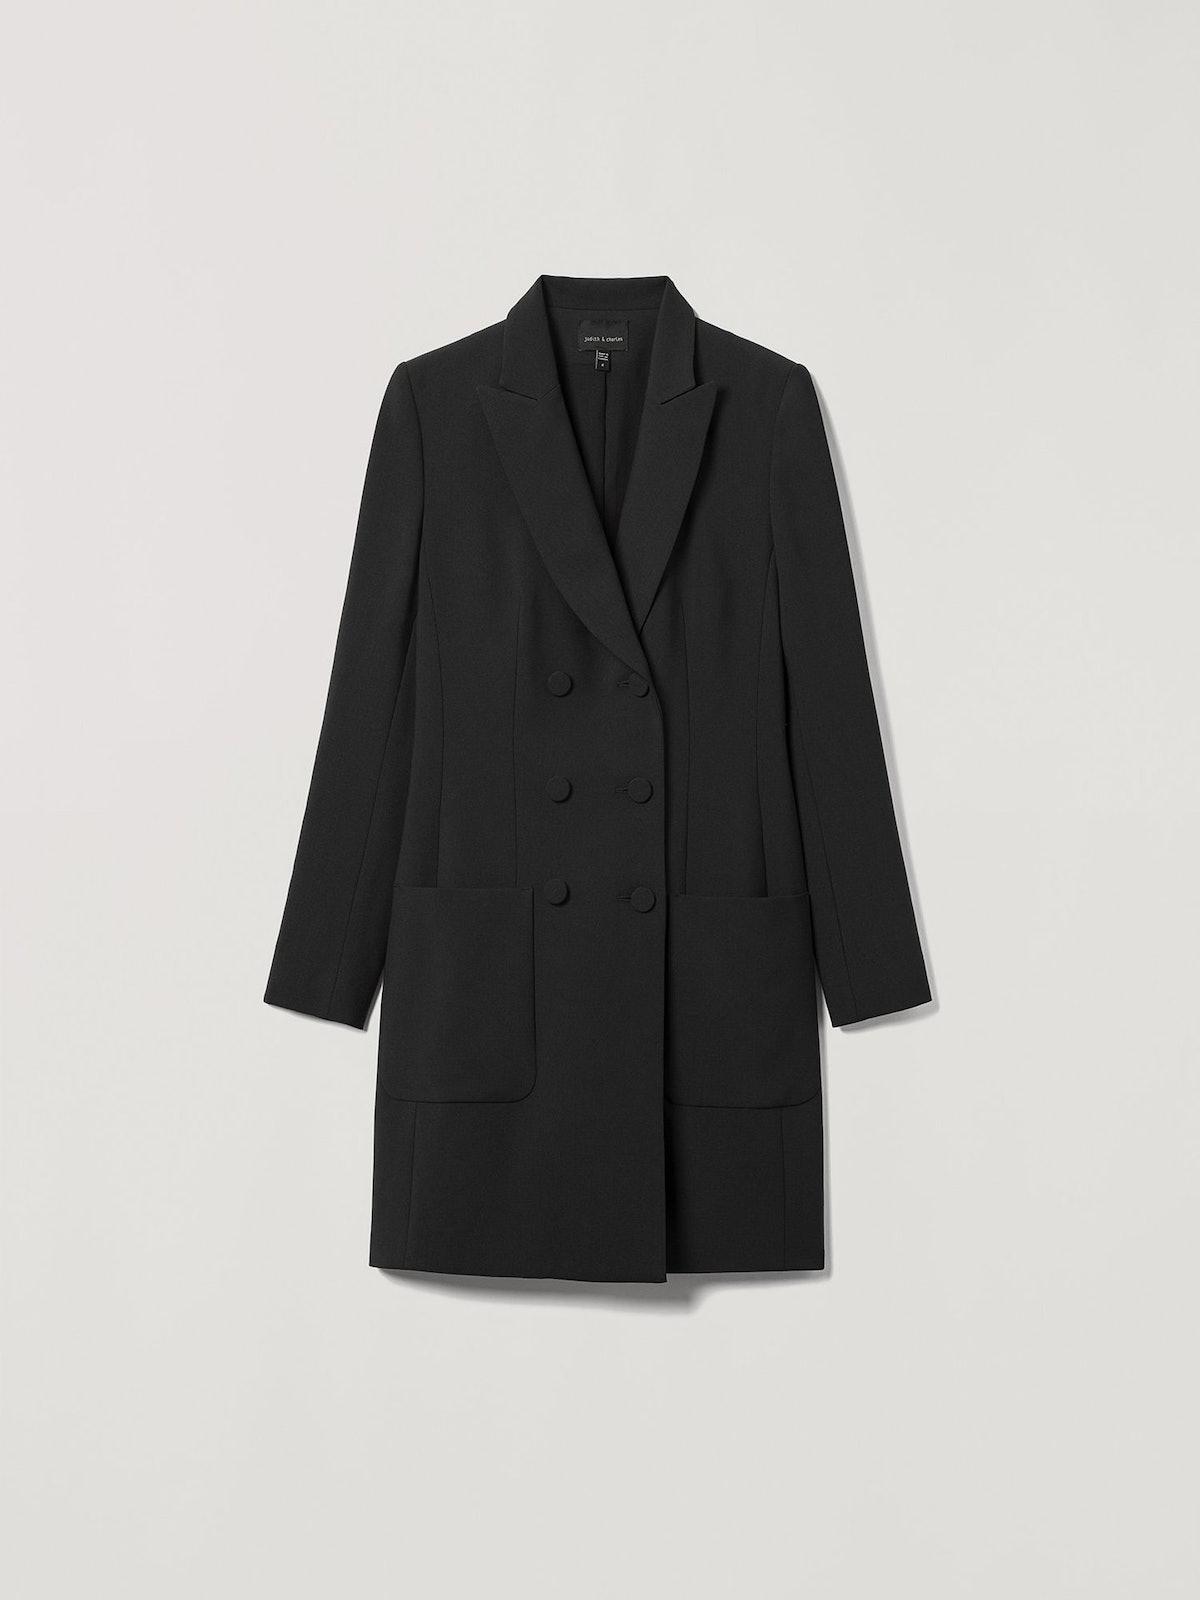 Digital Dress in Black